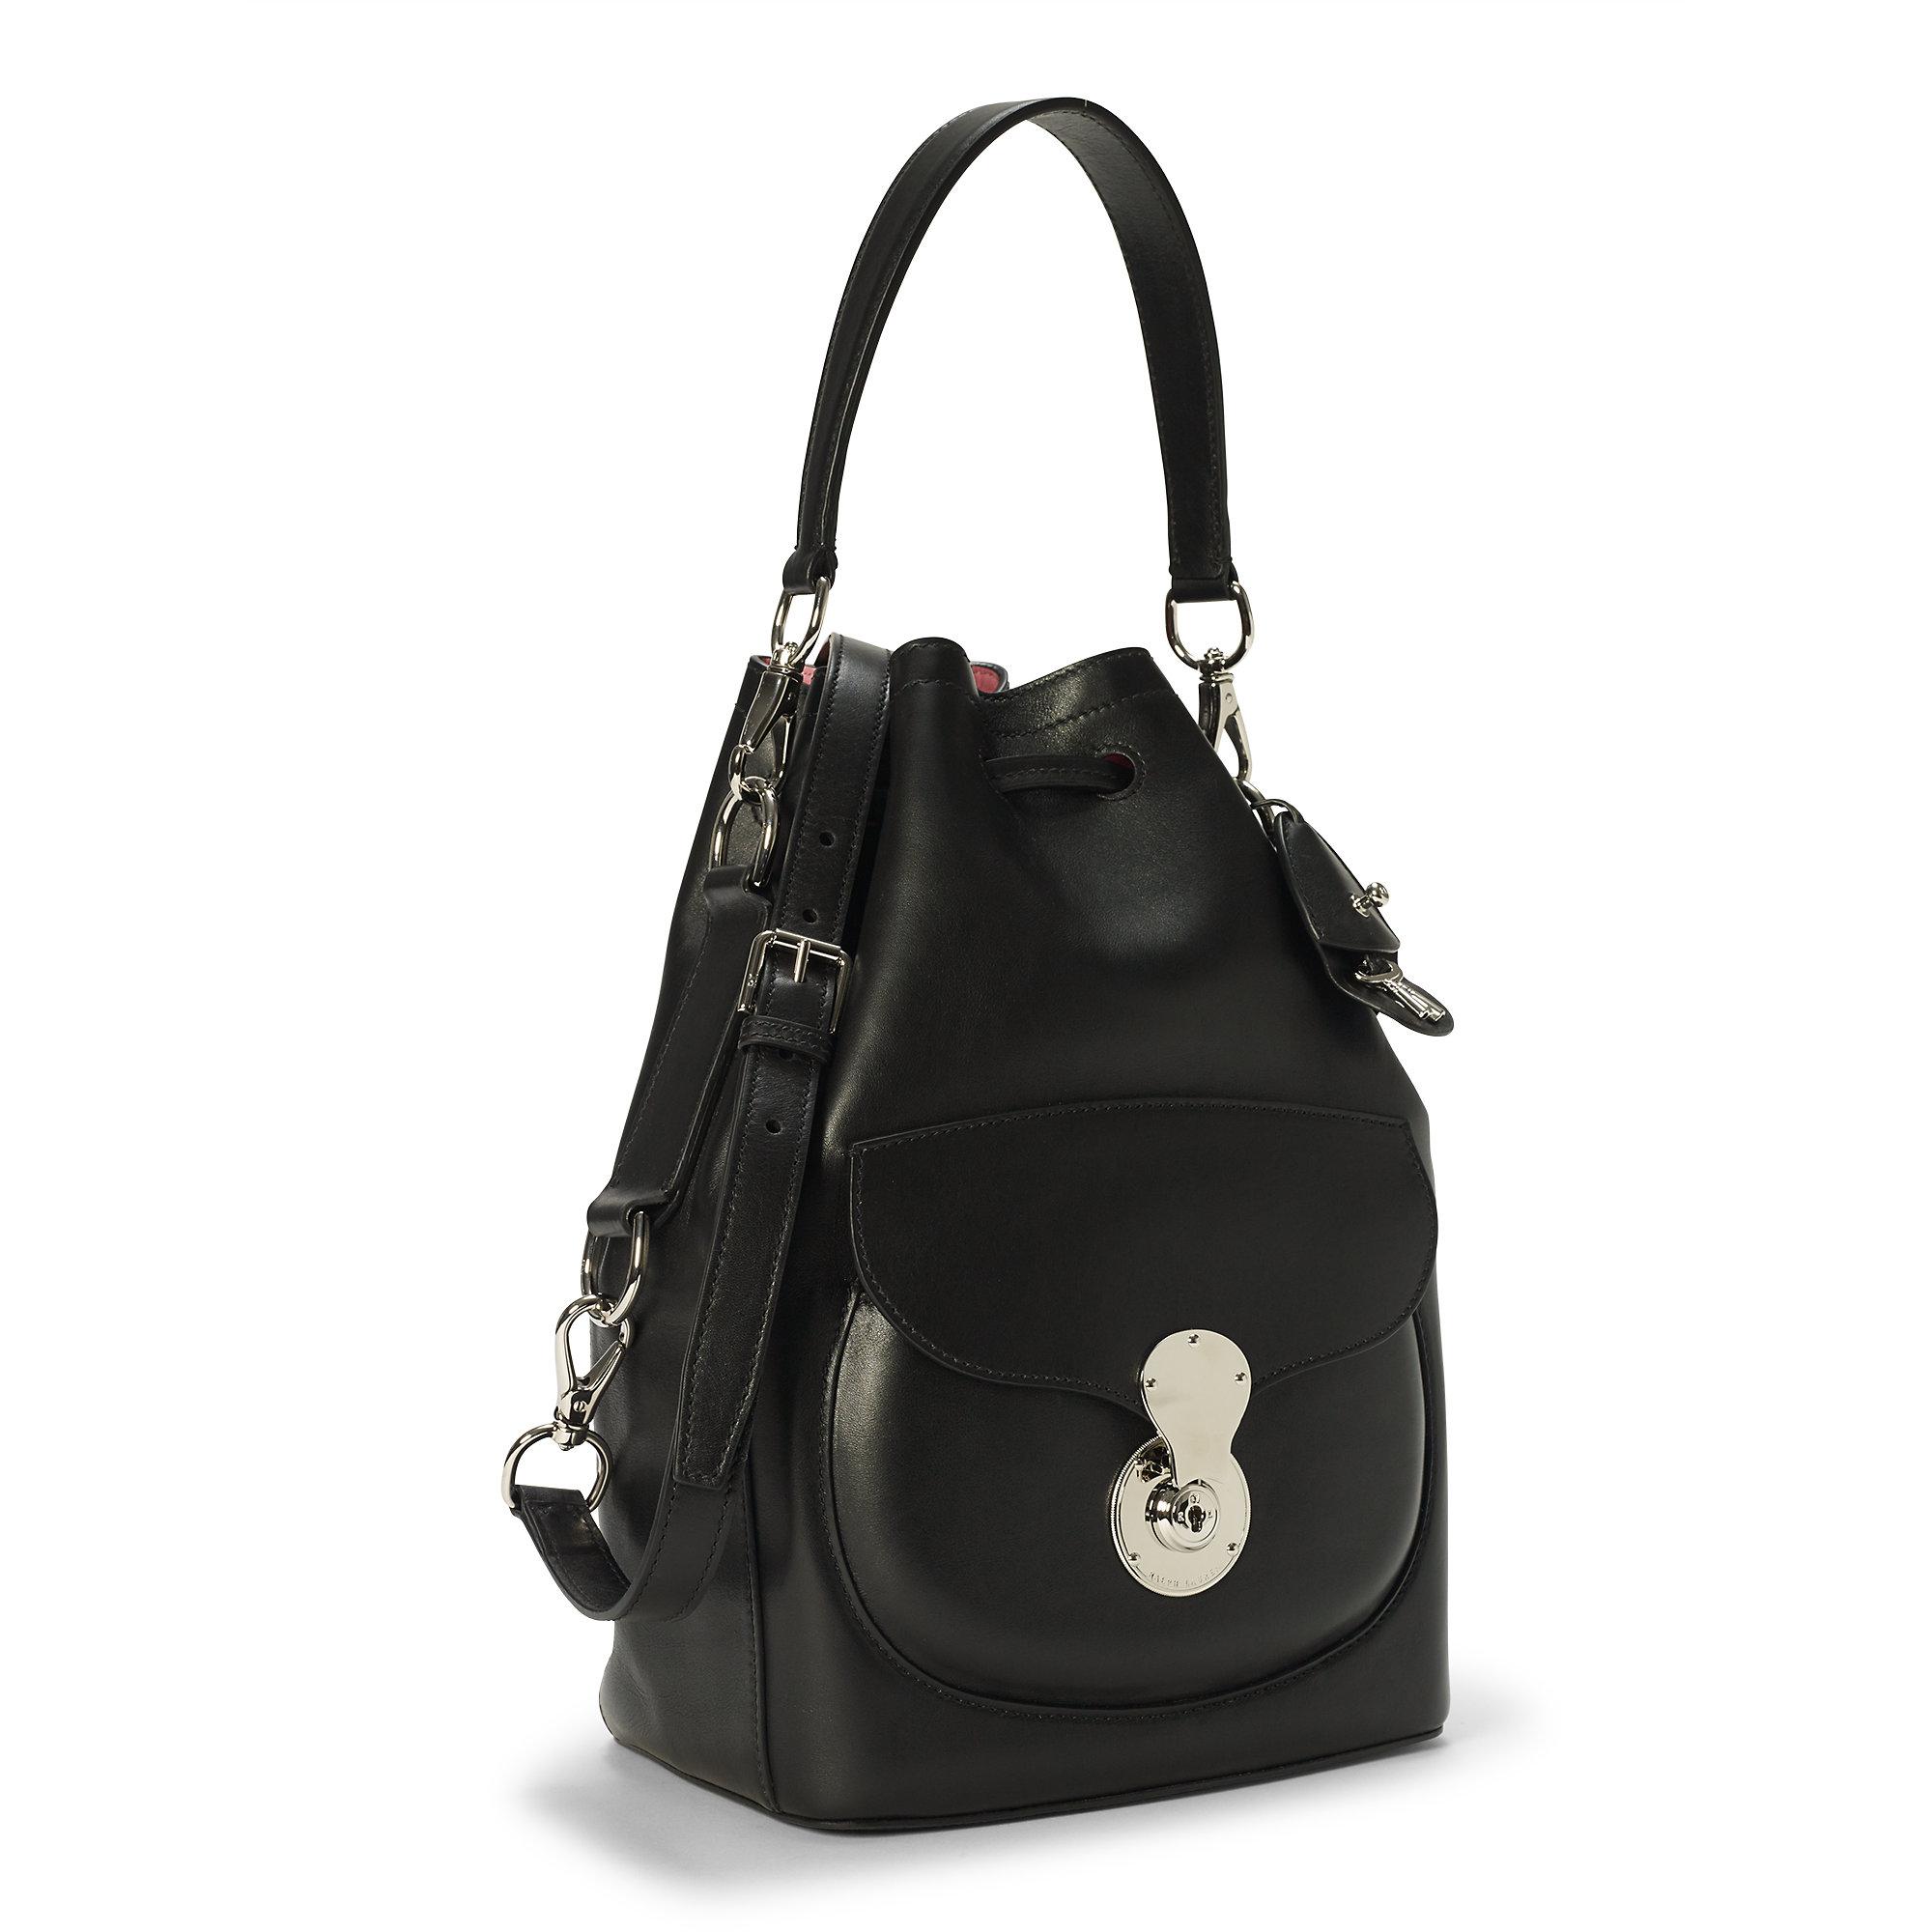 d876d7c50bdf Lyst - Pink Pony Pink Pony Ricky Drawstring Bag in Black